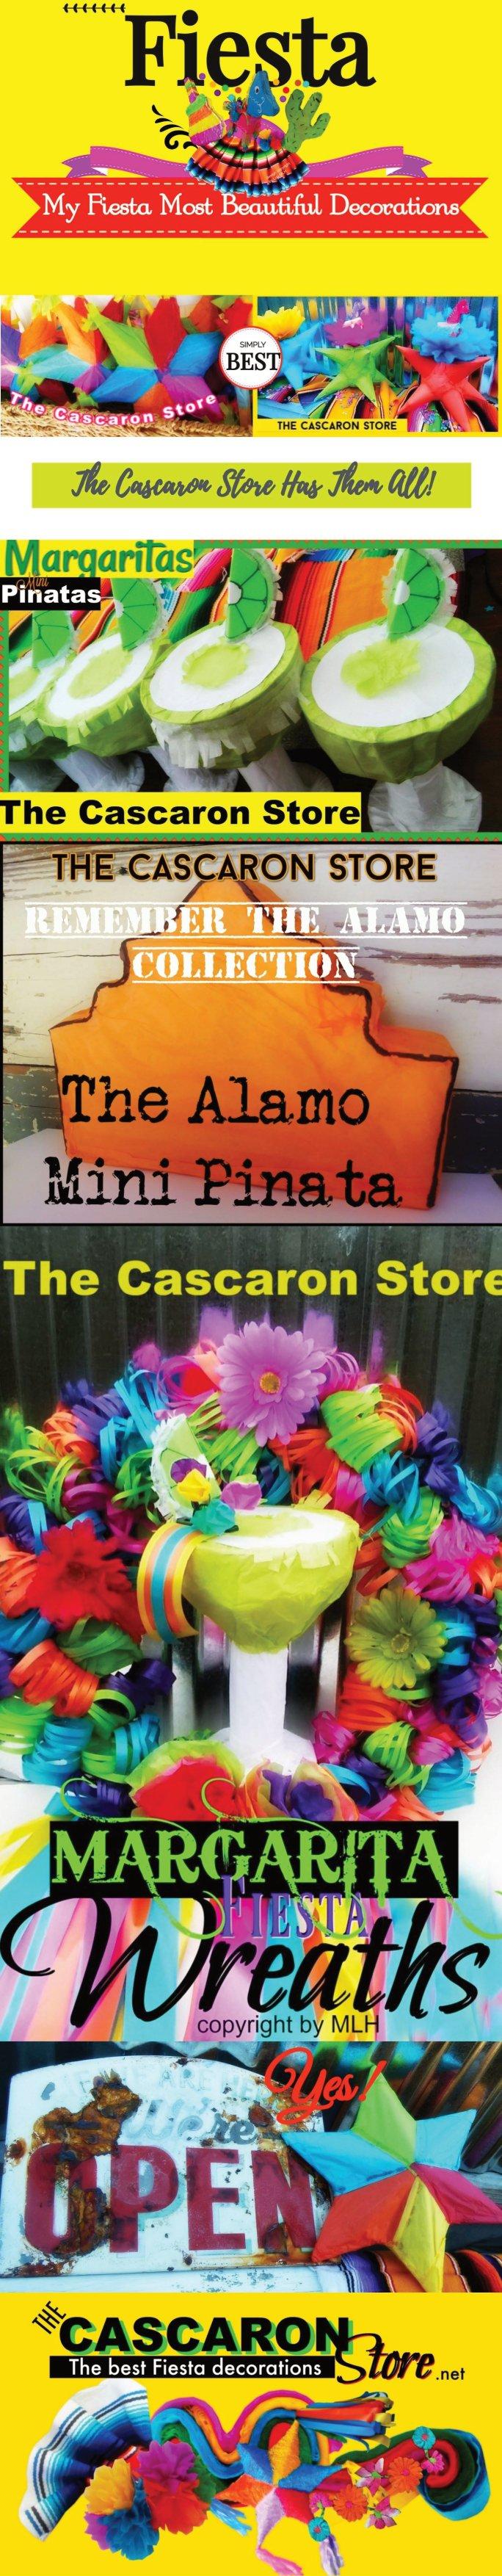 Fiesta Home Decoration Service